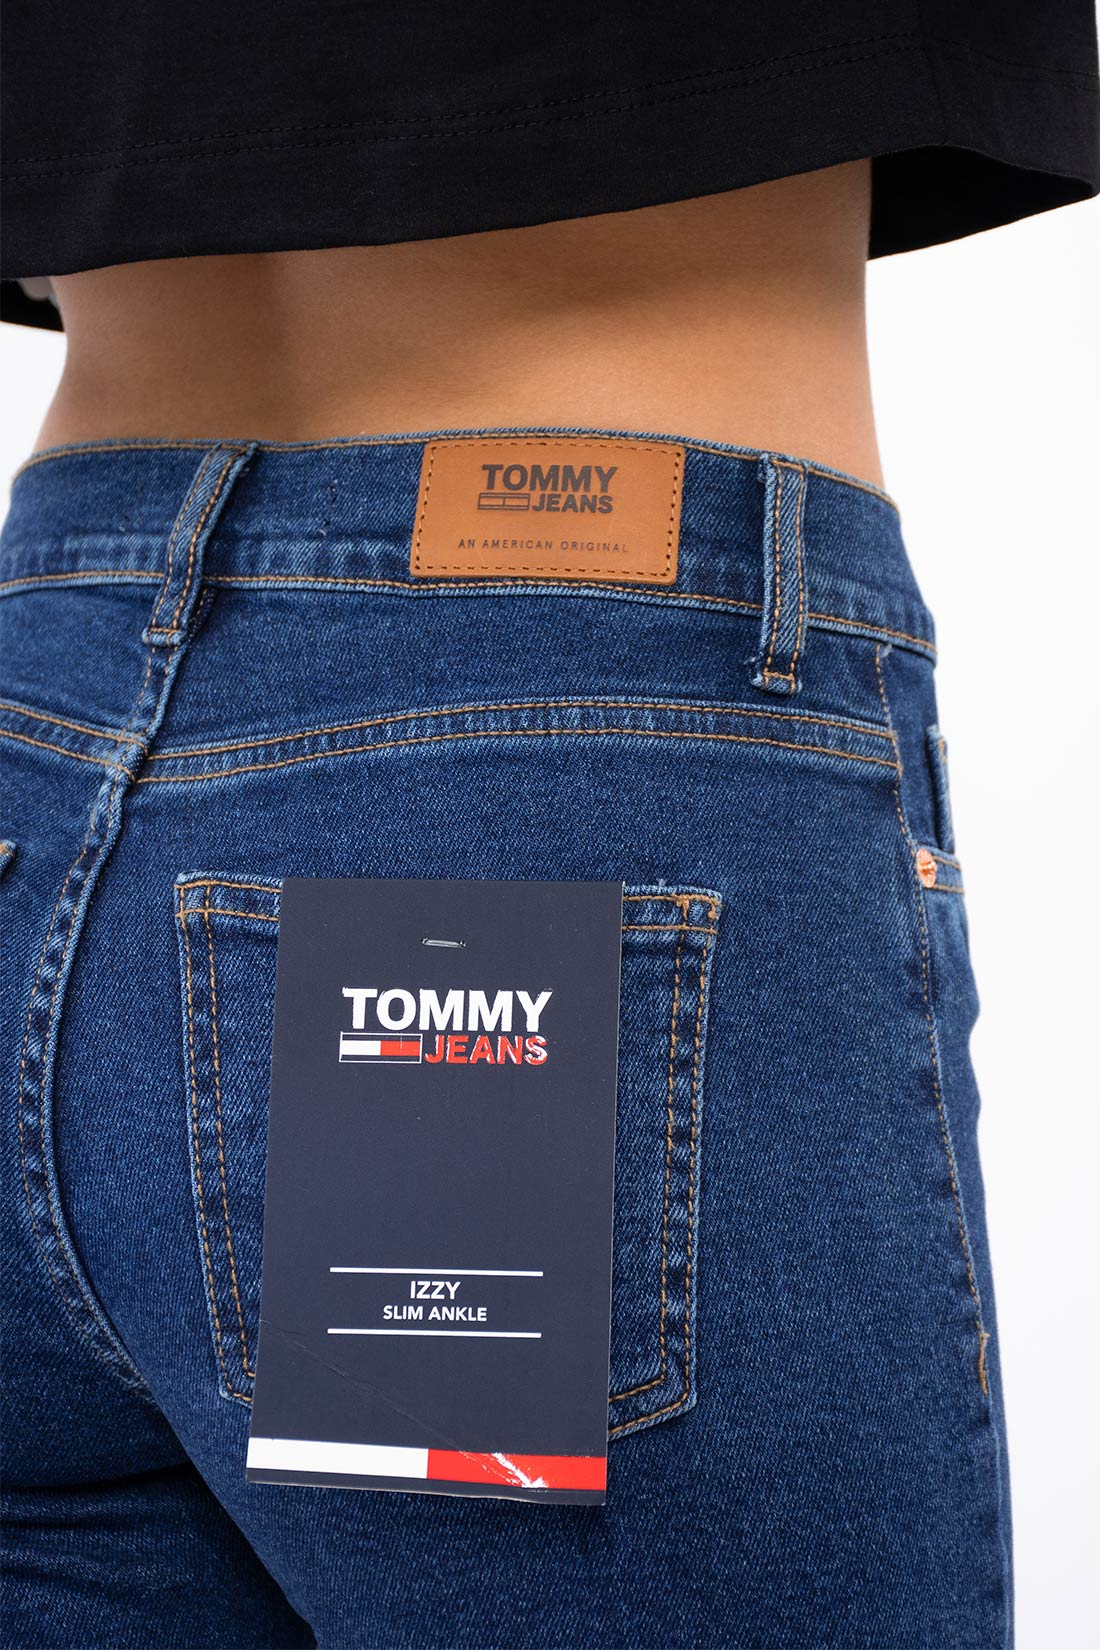 Calca Jeans Tommy Hilfiger Slim Ankle